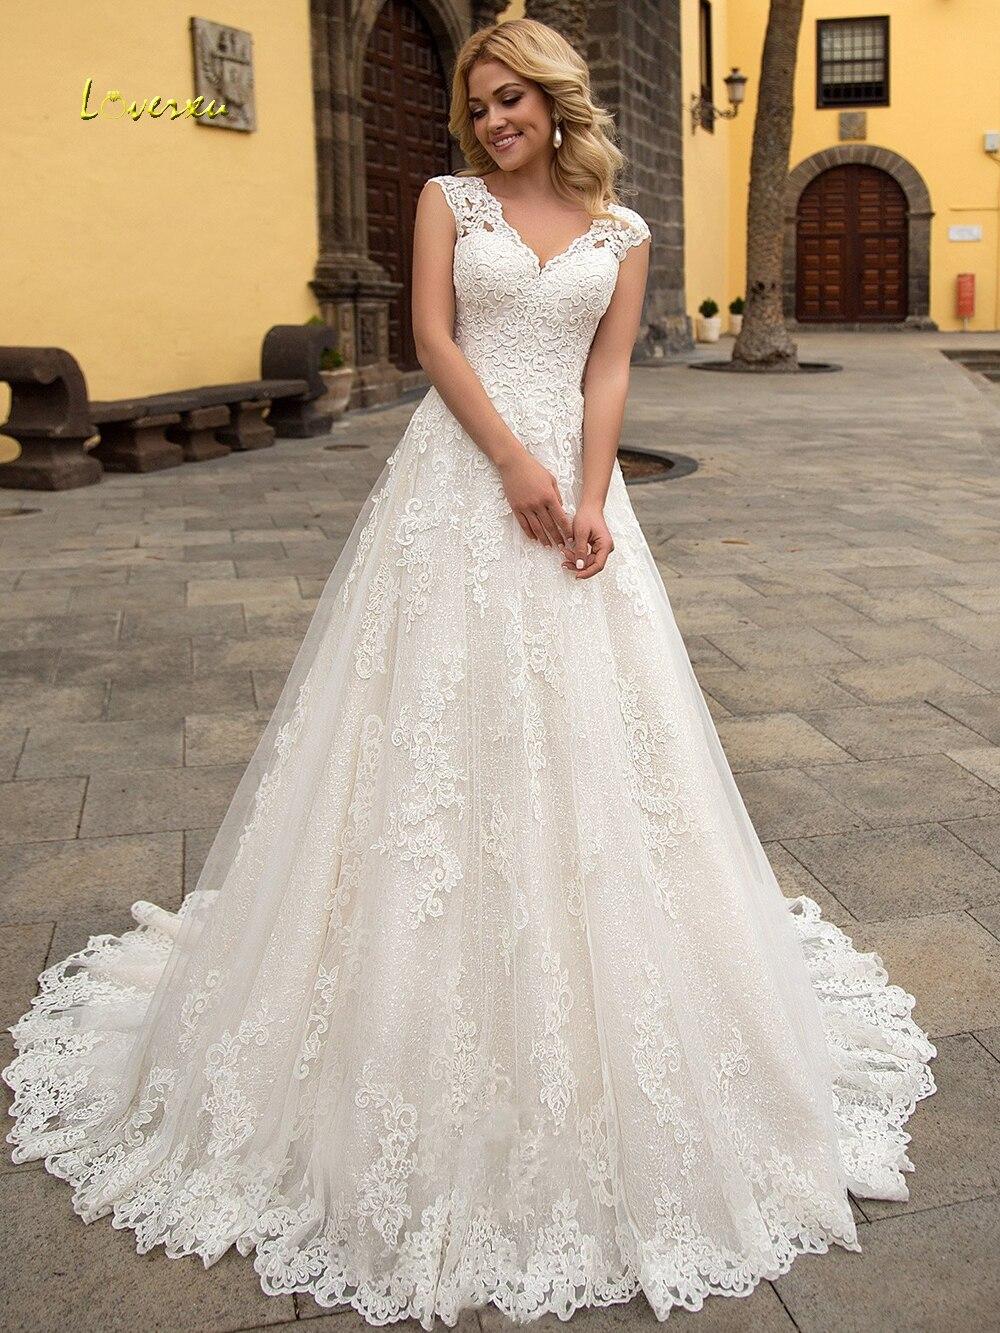 Loverxu Sexy V Nck Appliques Lace A Line Wedding Dresses 2019 Appliques Cap Sleeve Court Train